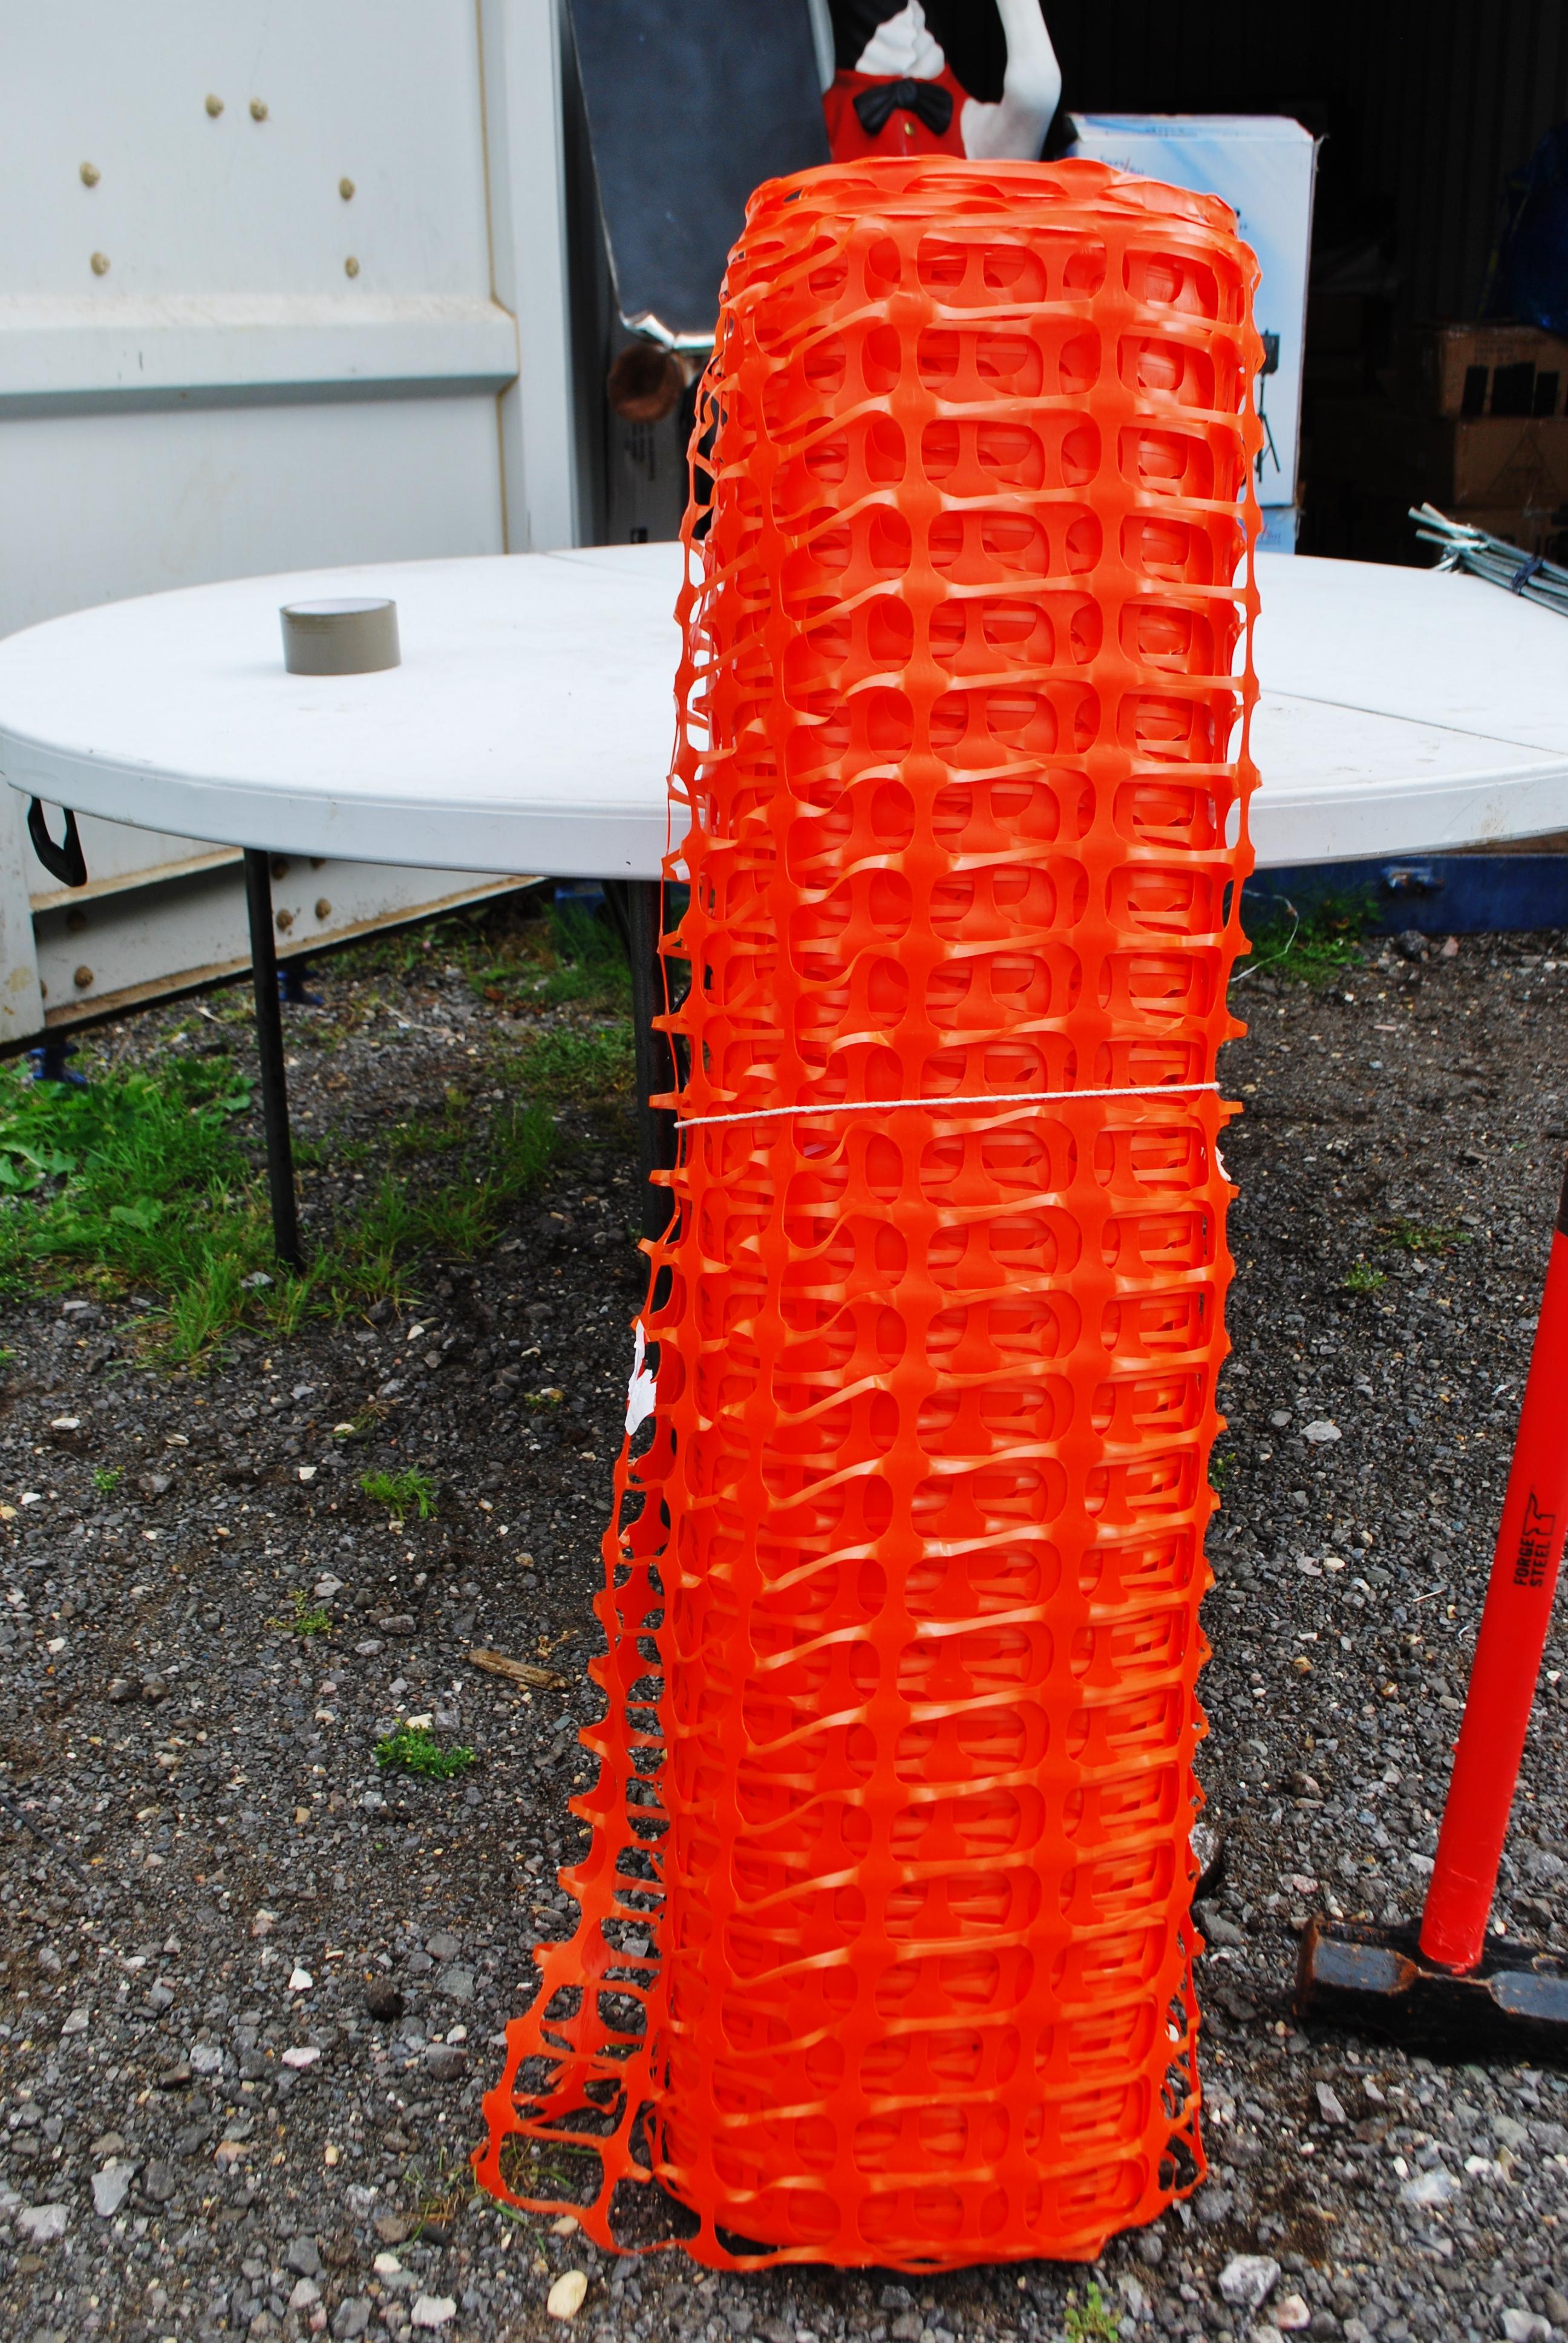 equip_orange_netting_roll